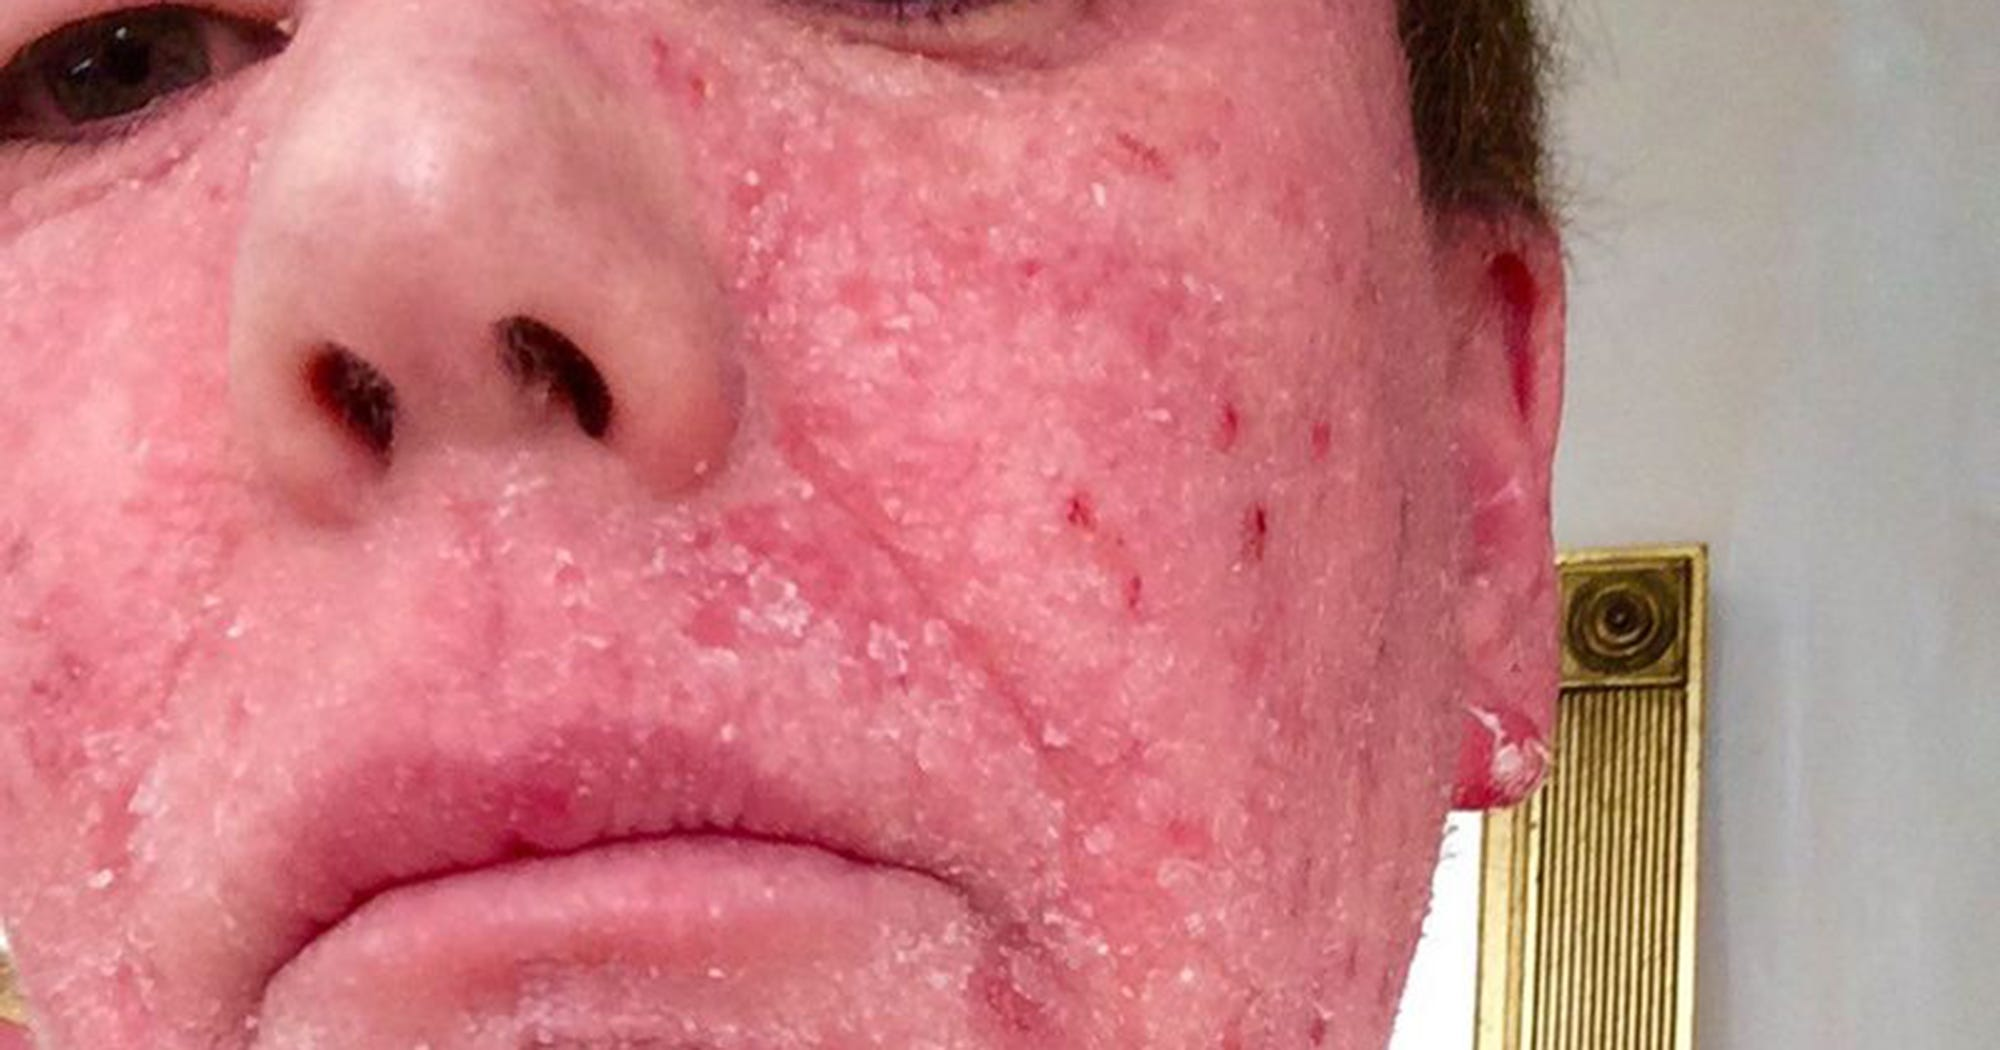 Using Topical Cortisone to Treat Eczema